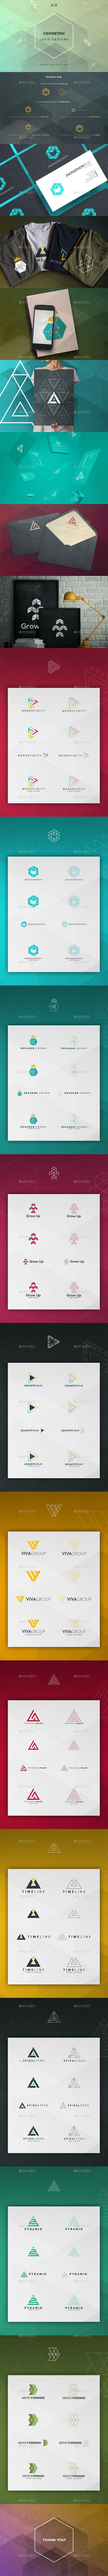 Geometric Logo Designs   Marca personal y Marcas